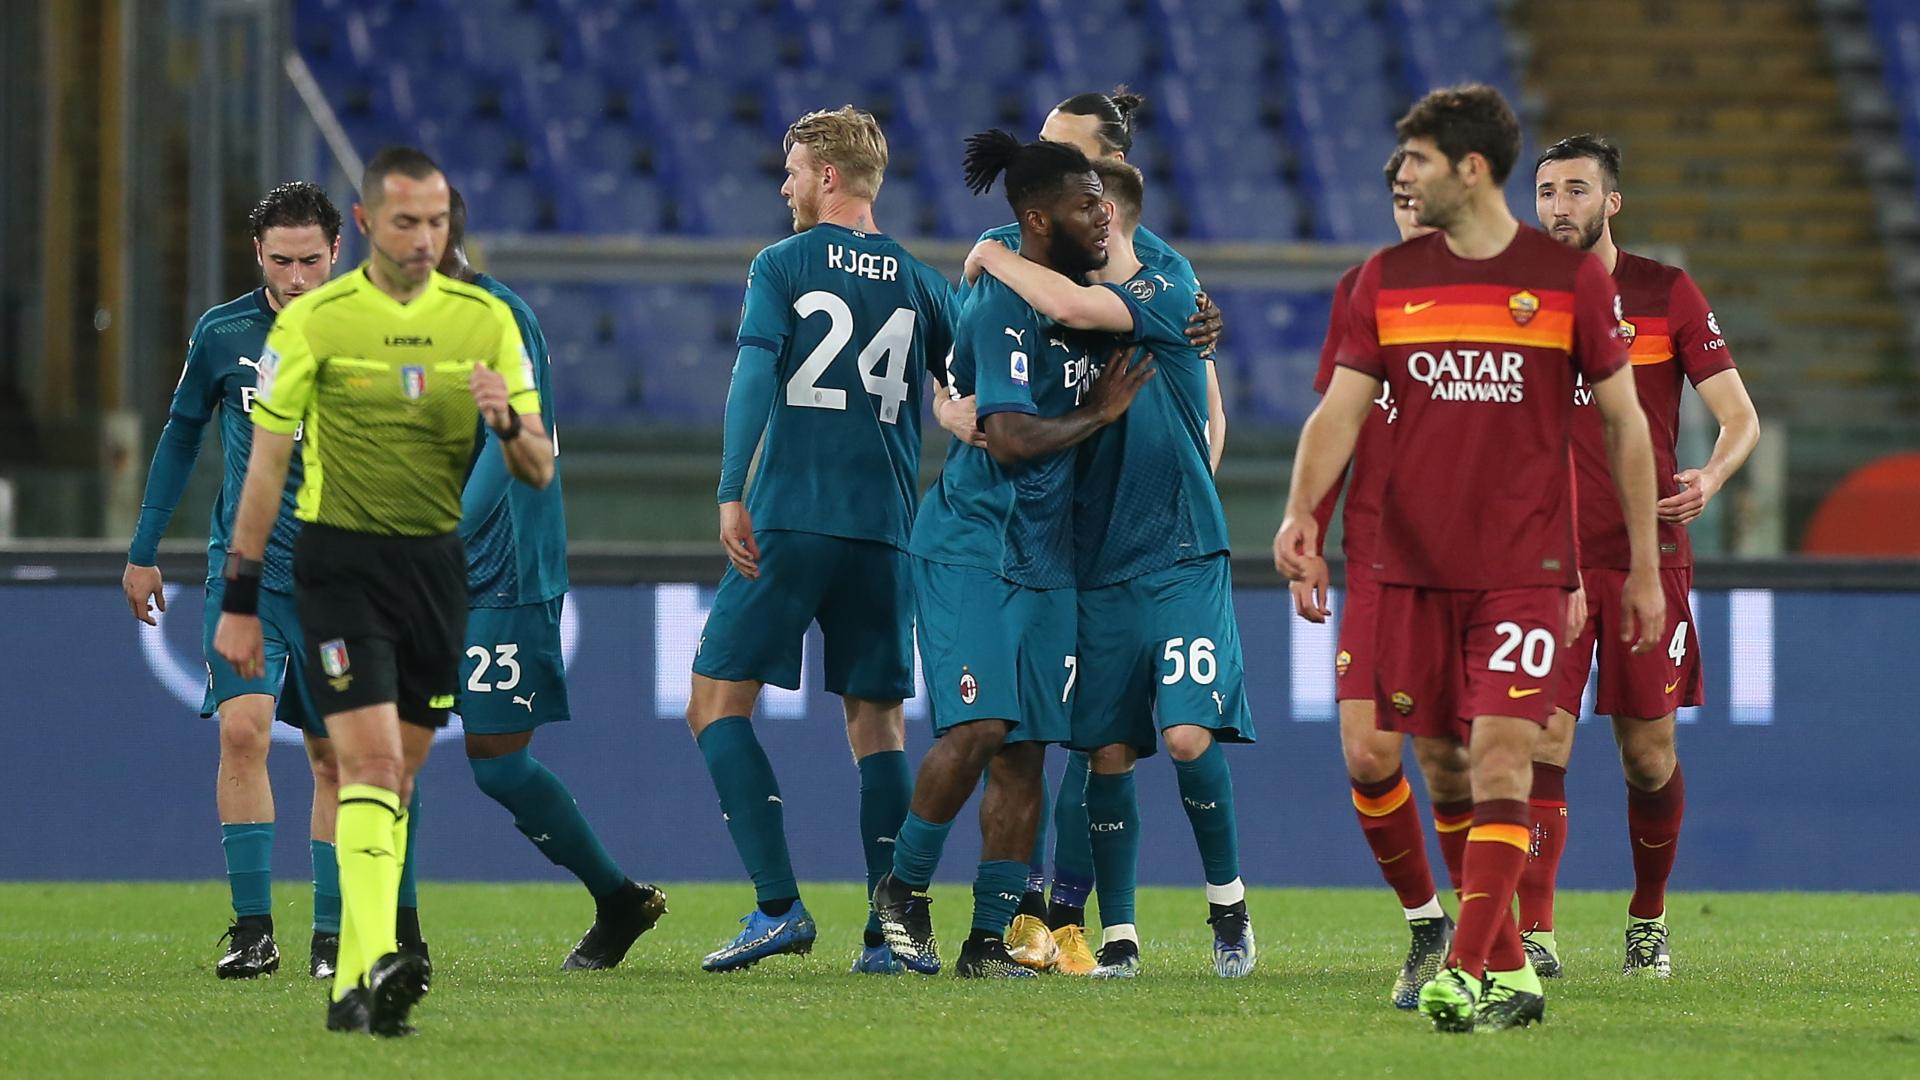 Roma-Milan 1-2: Kessié e Rebic, l'Inter resta a -4